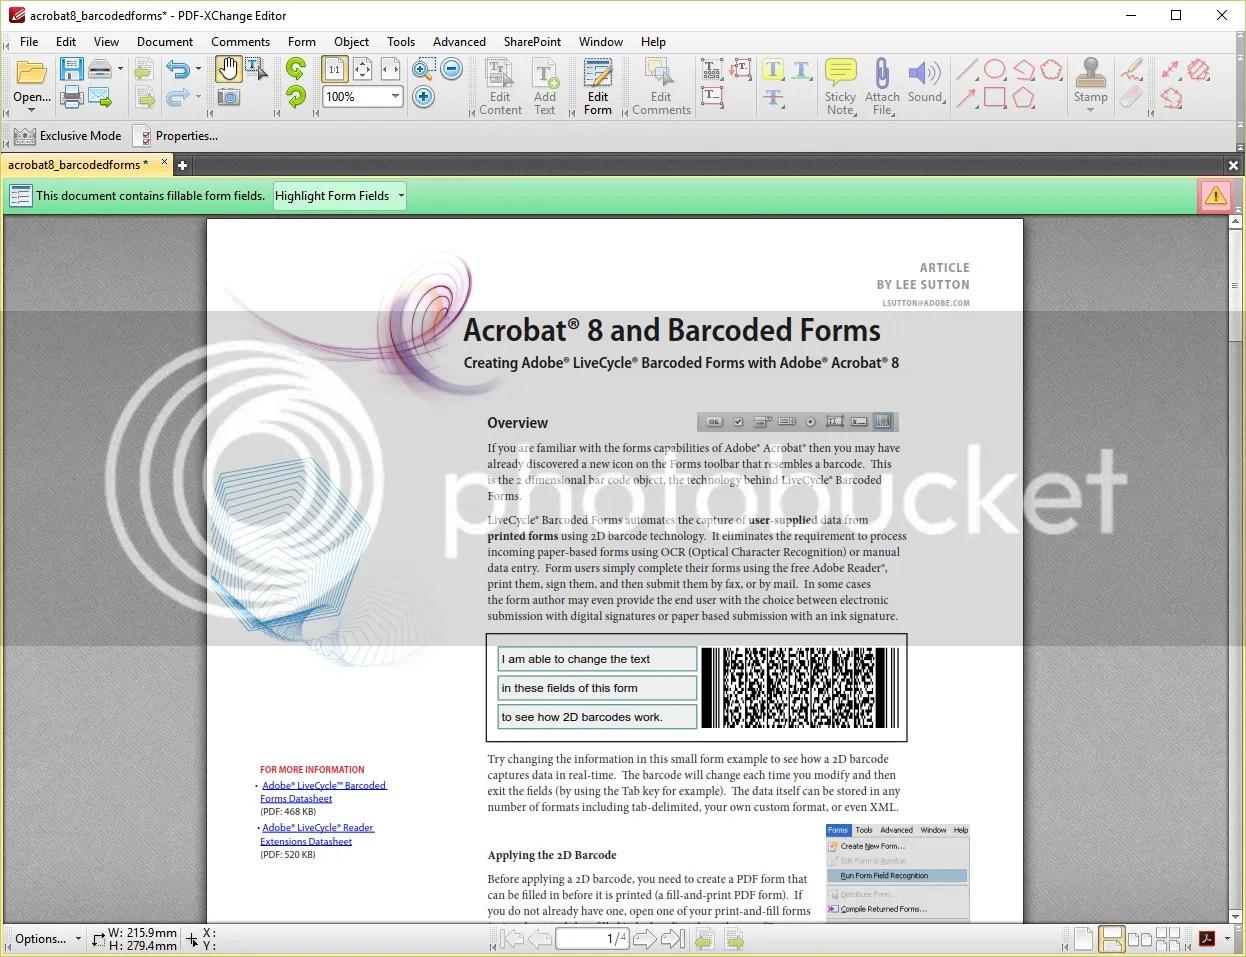 PDF-XChange Editor - acrobat8_barcodedforms.pdf